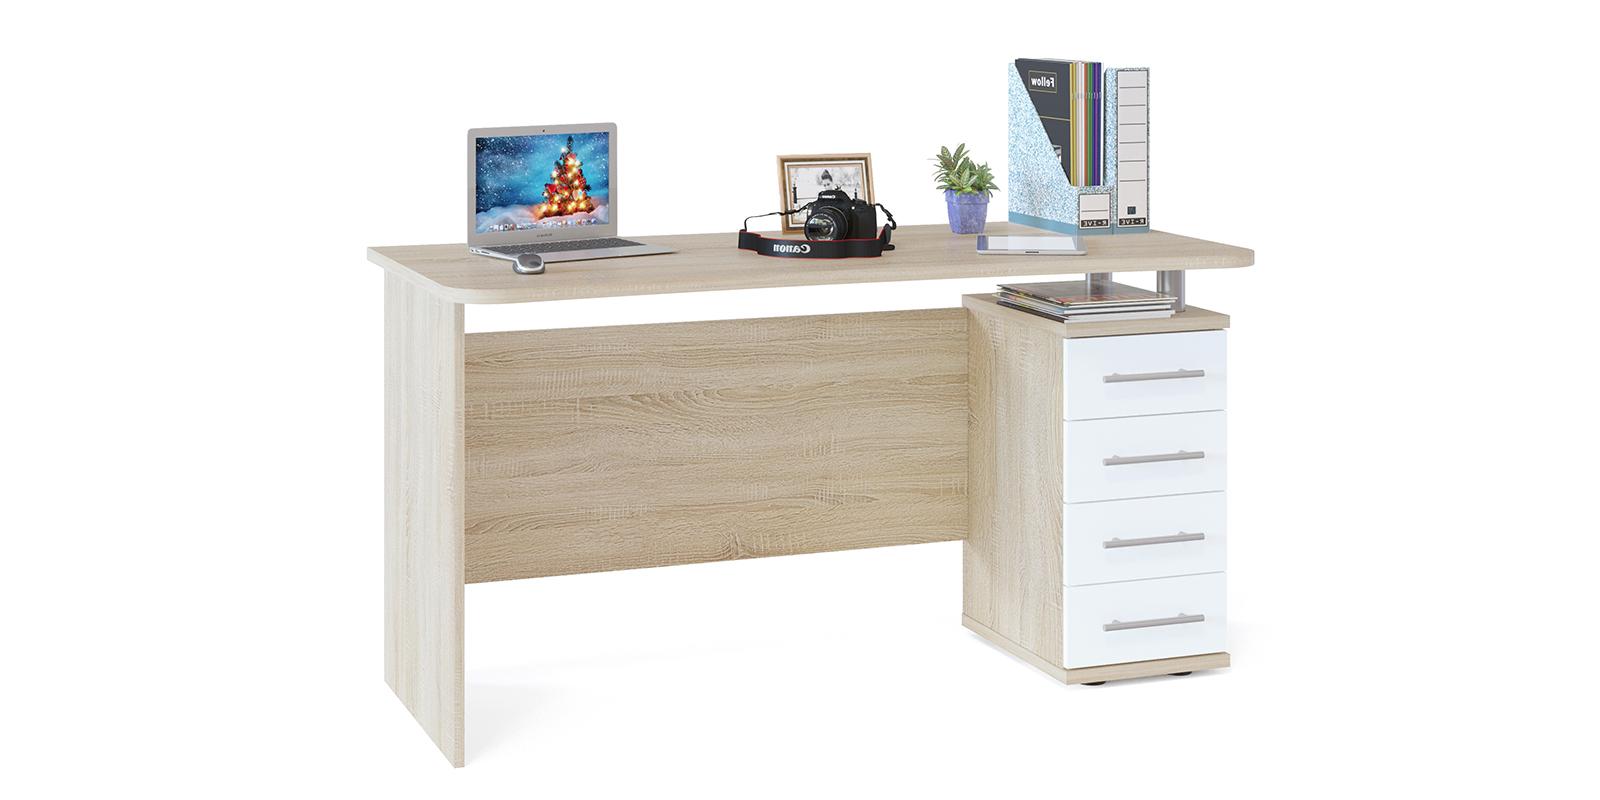 Стол компьютерный Сноу вариант №2 (дуб сонома/белый) от HomeMe.ru